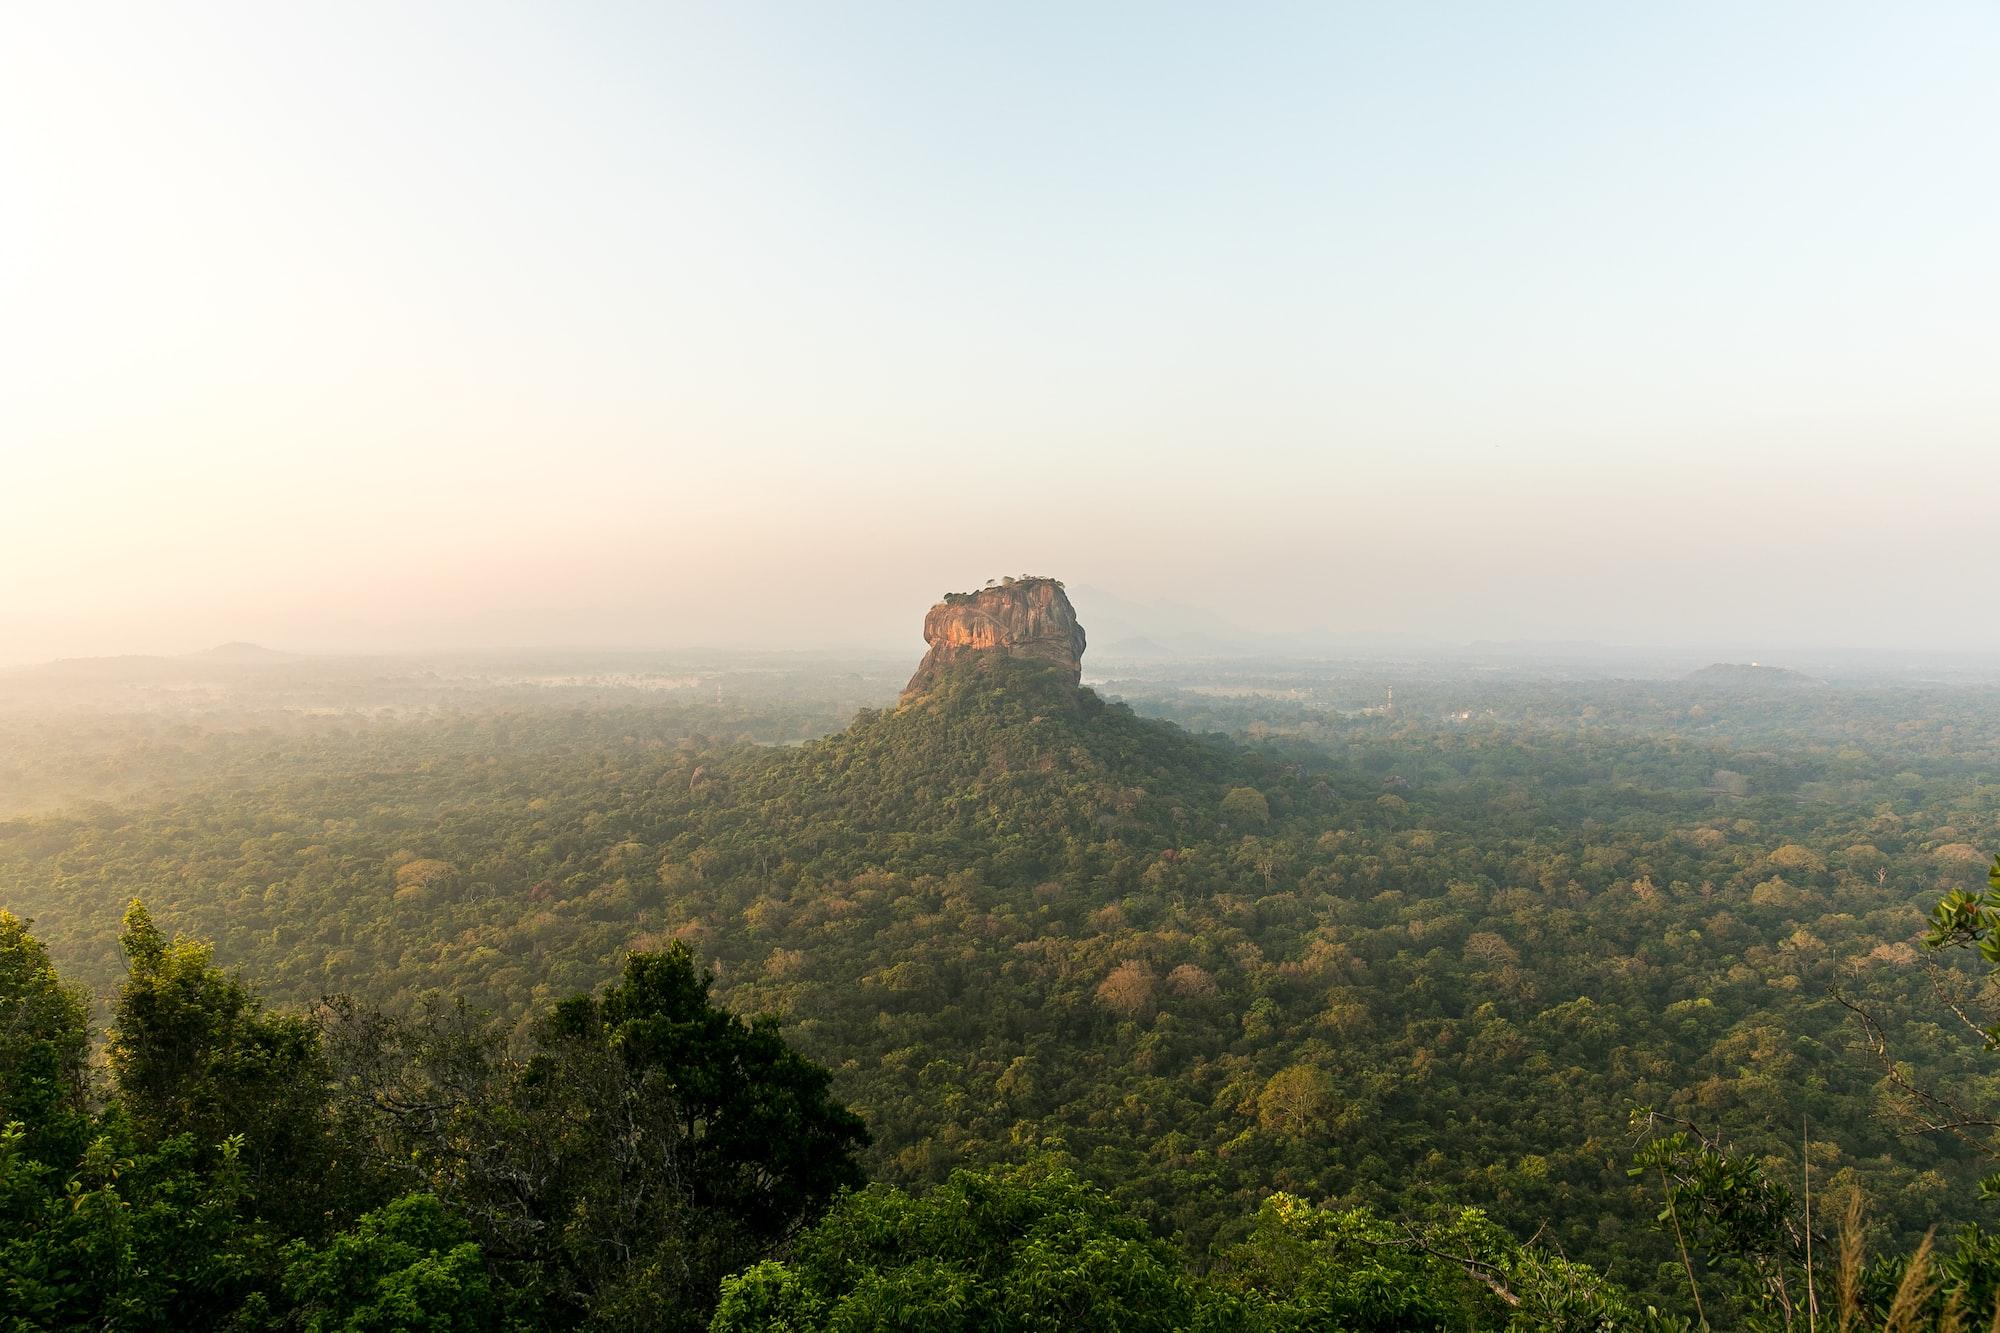 Sri Lanka 🇱🇰